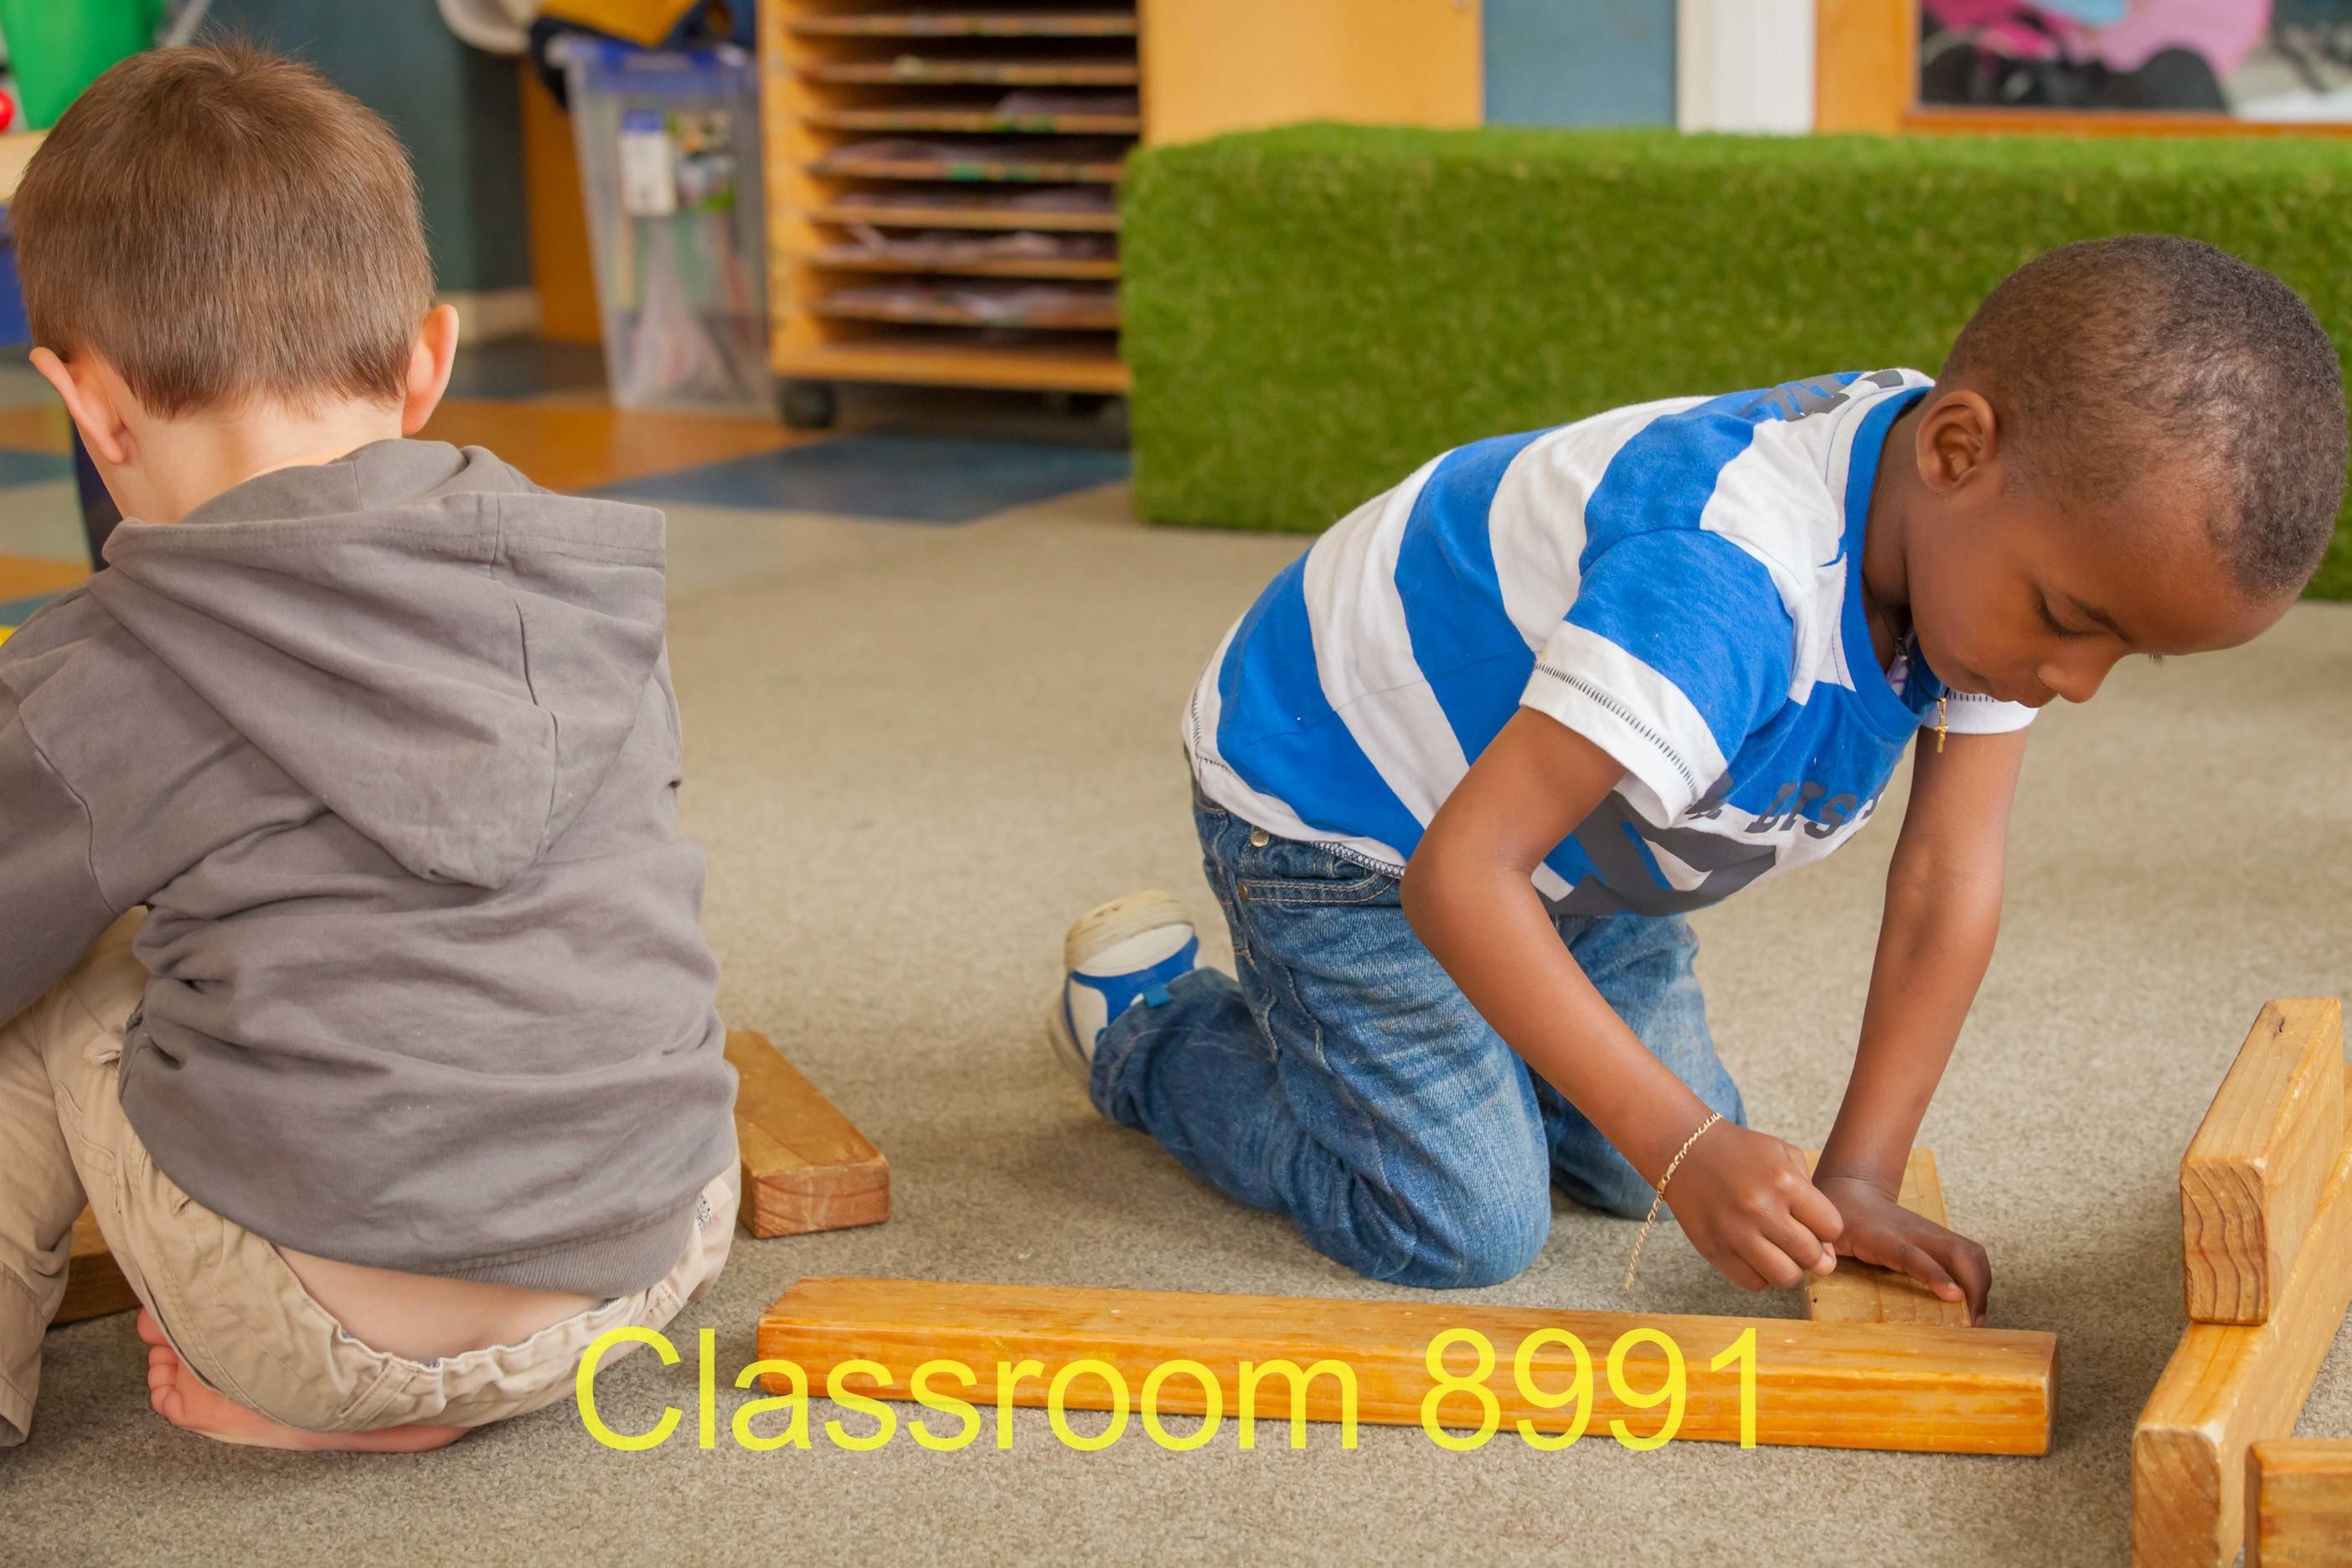 Classroom 8991